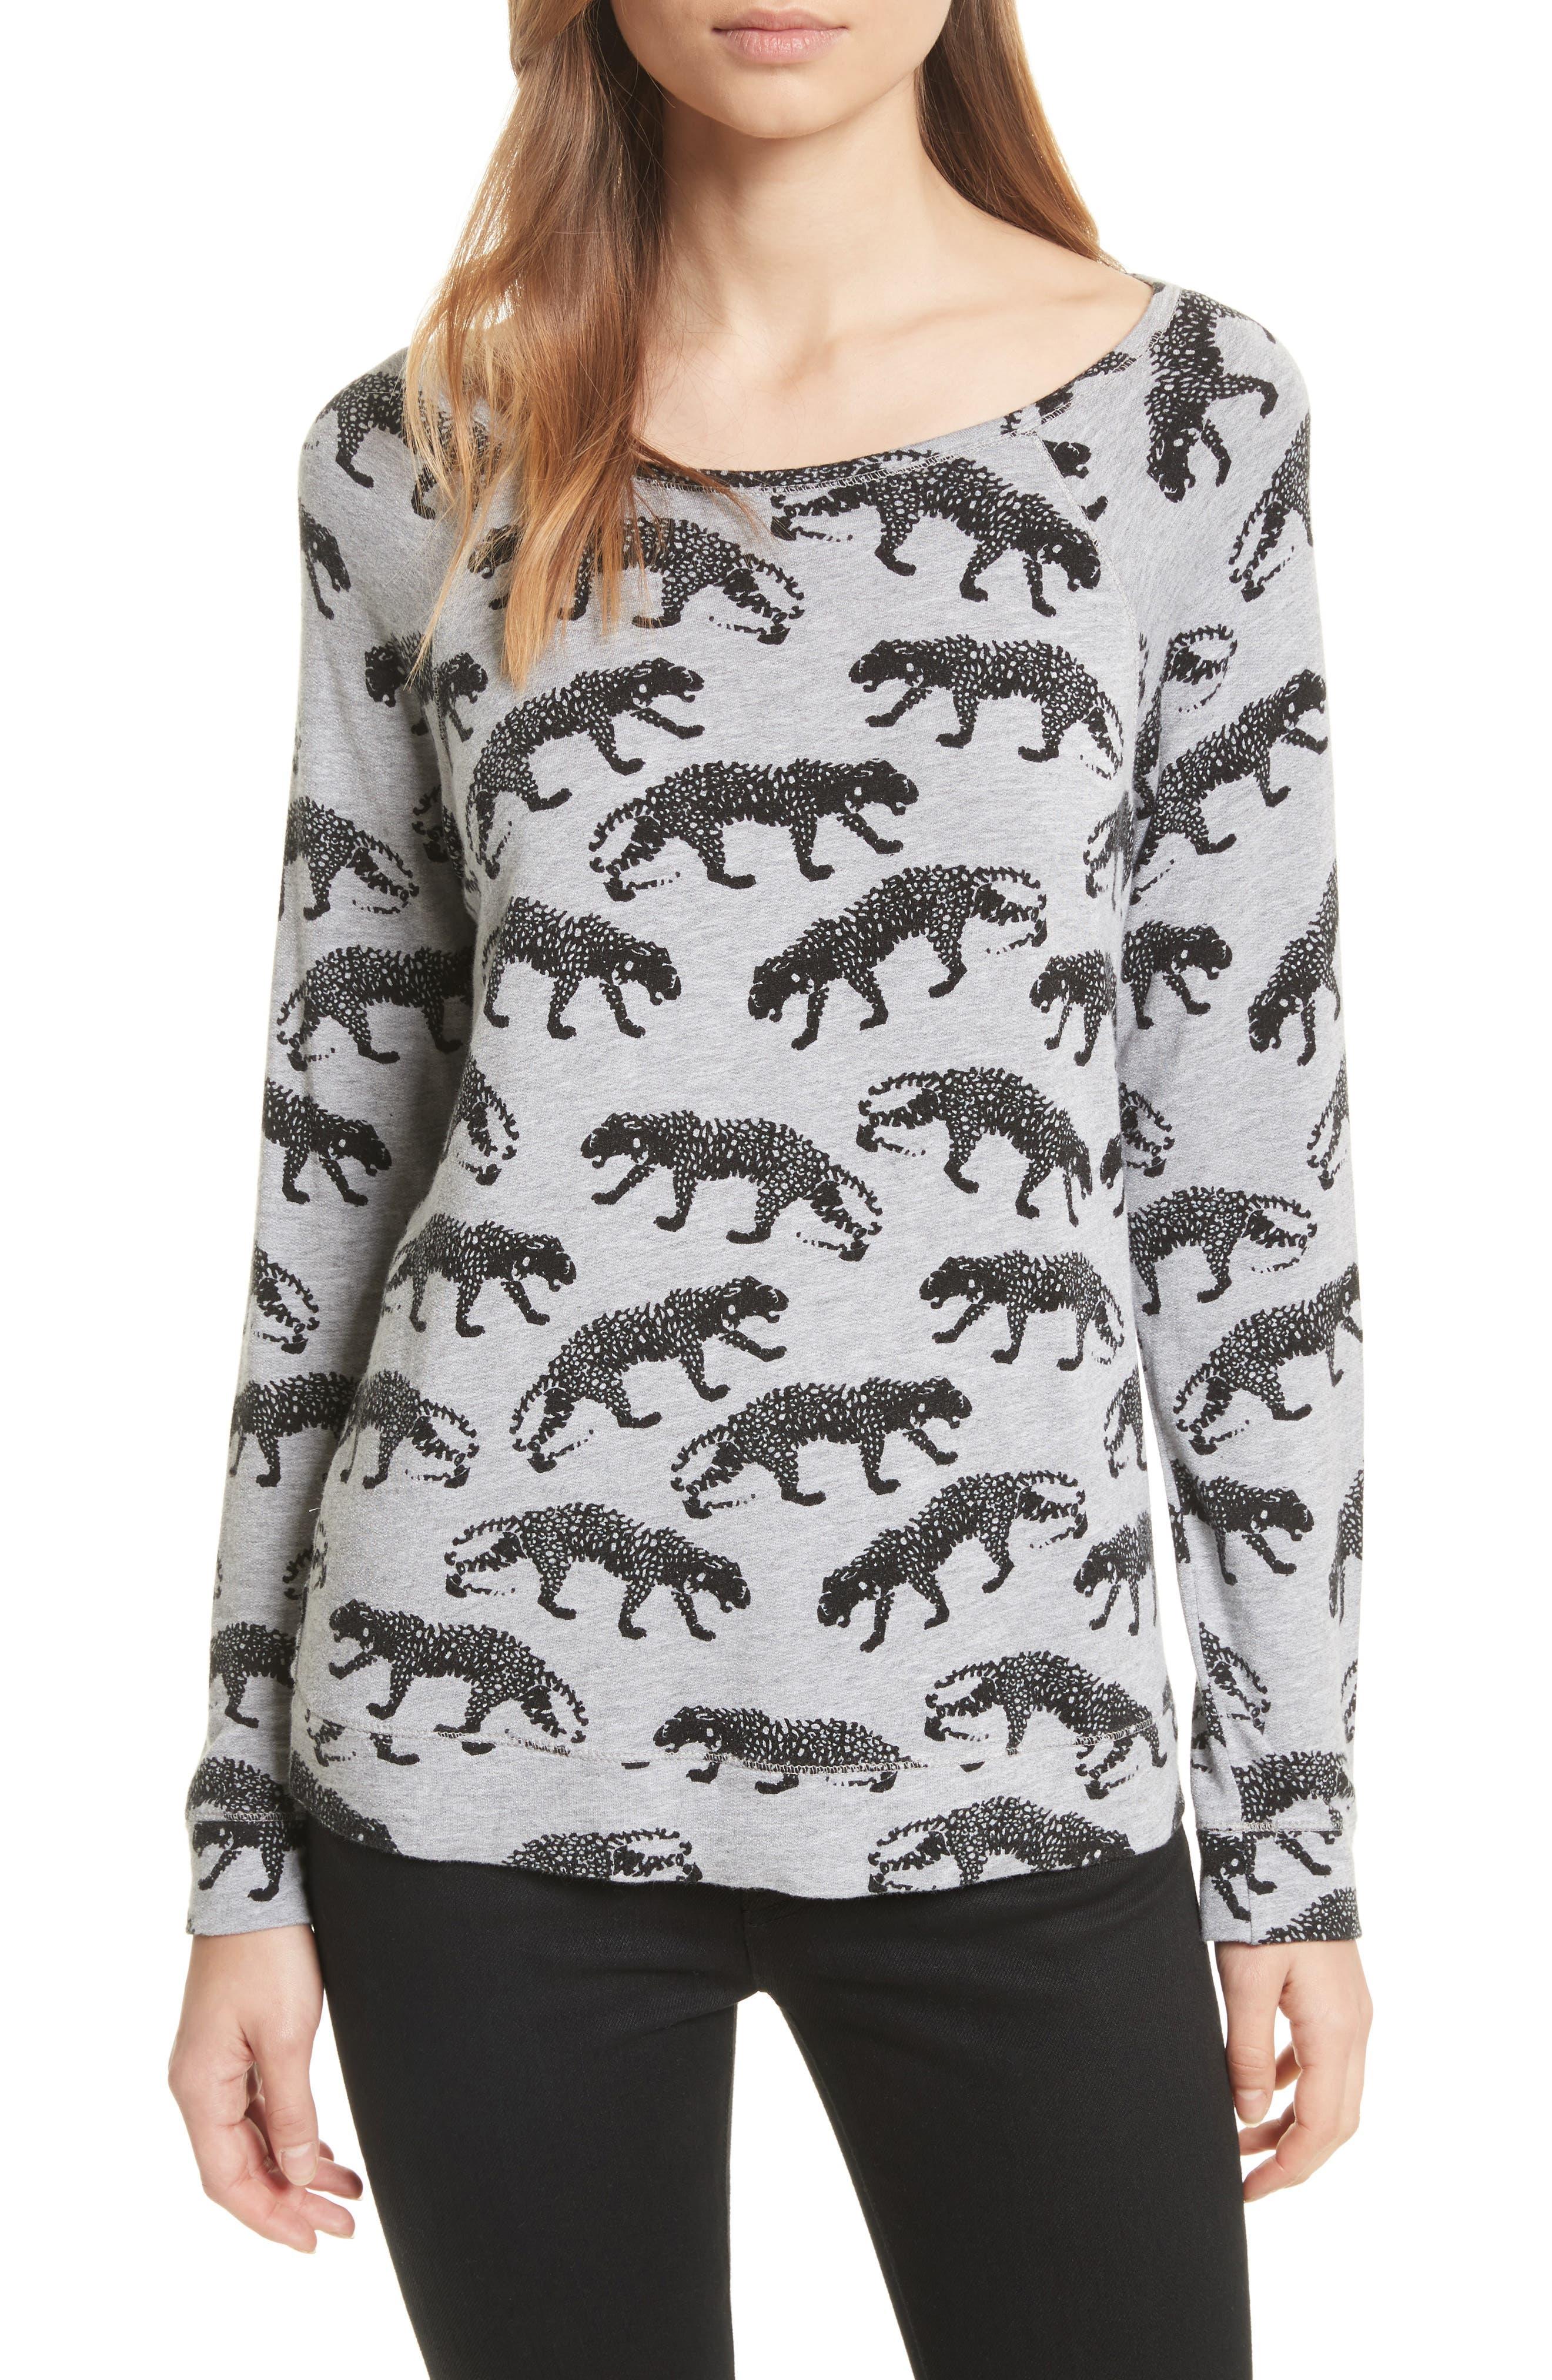 Annora B Animal Print Sweatshirt,                         Main,                         color, 033